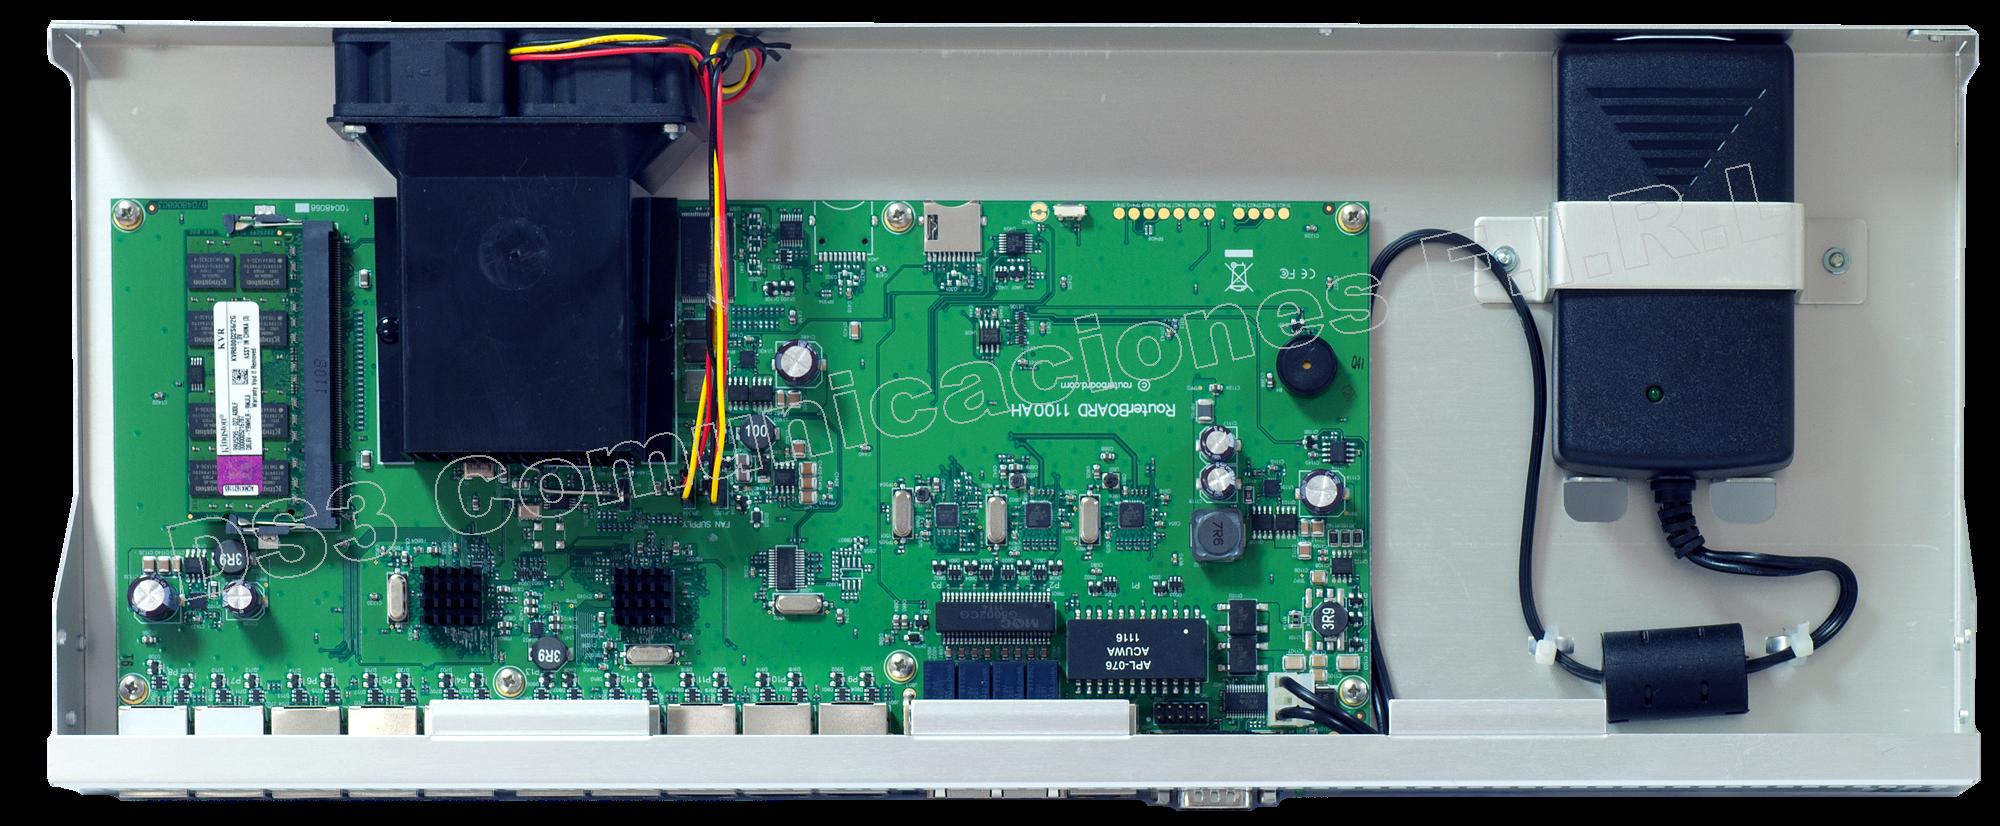 Routerboard Con 13 Puertos Gigabit Ethernet Mikrotik